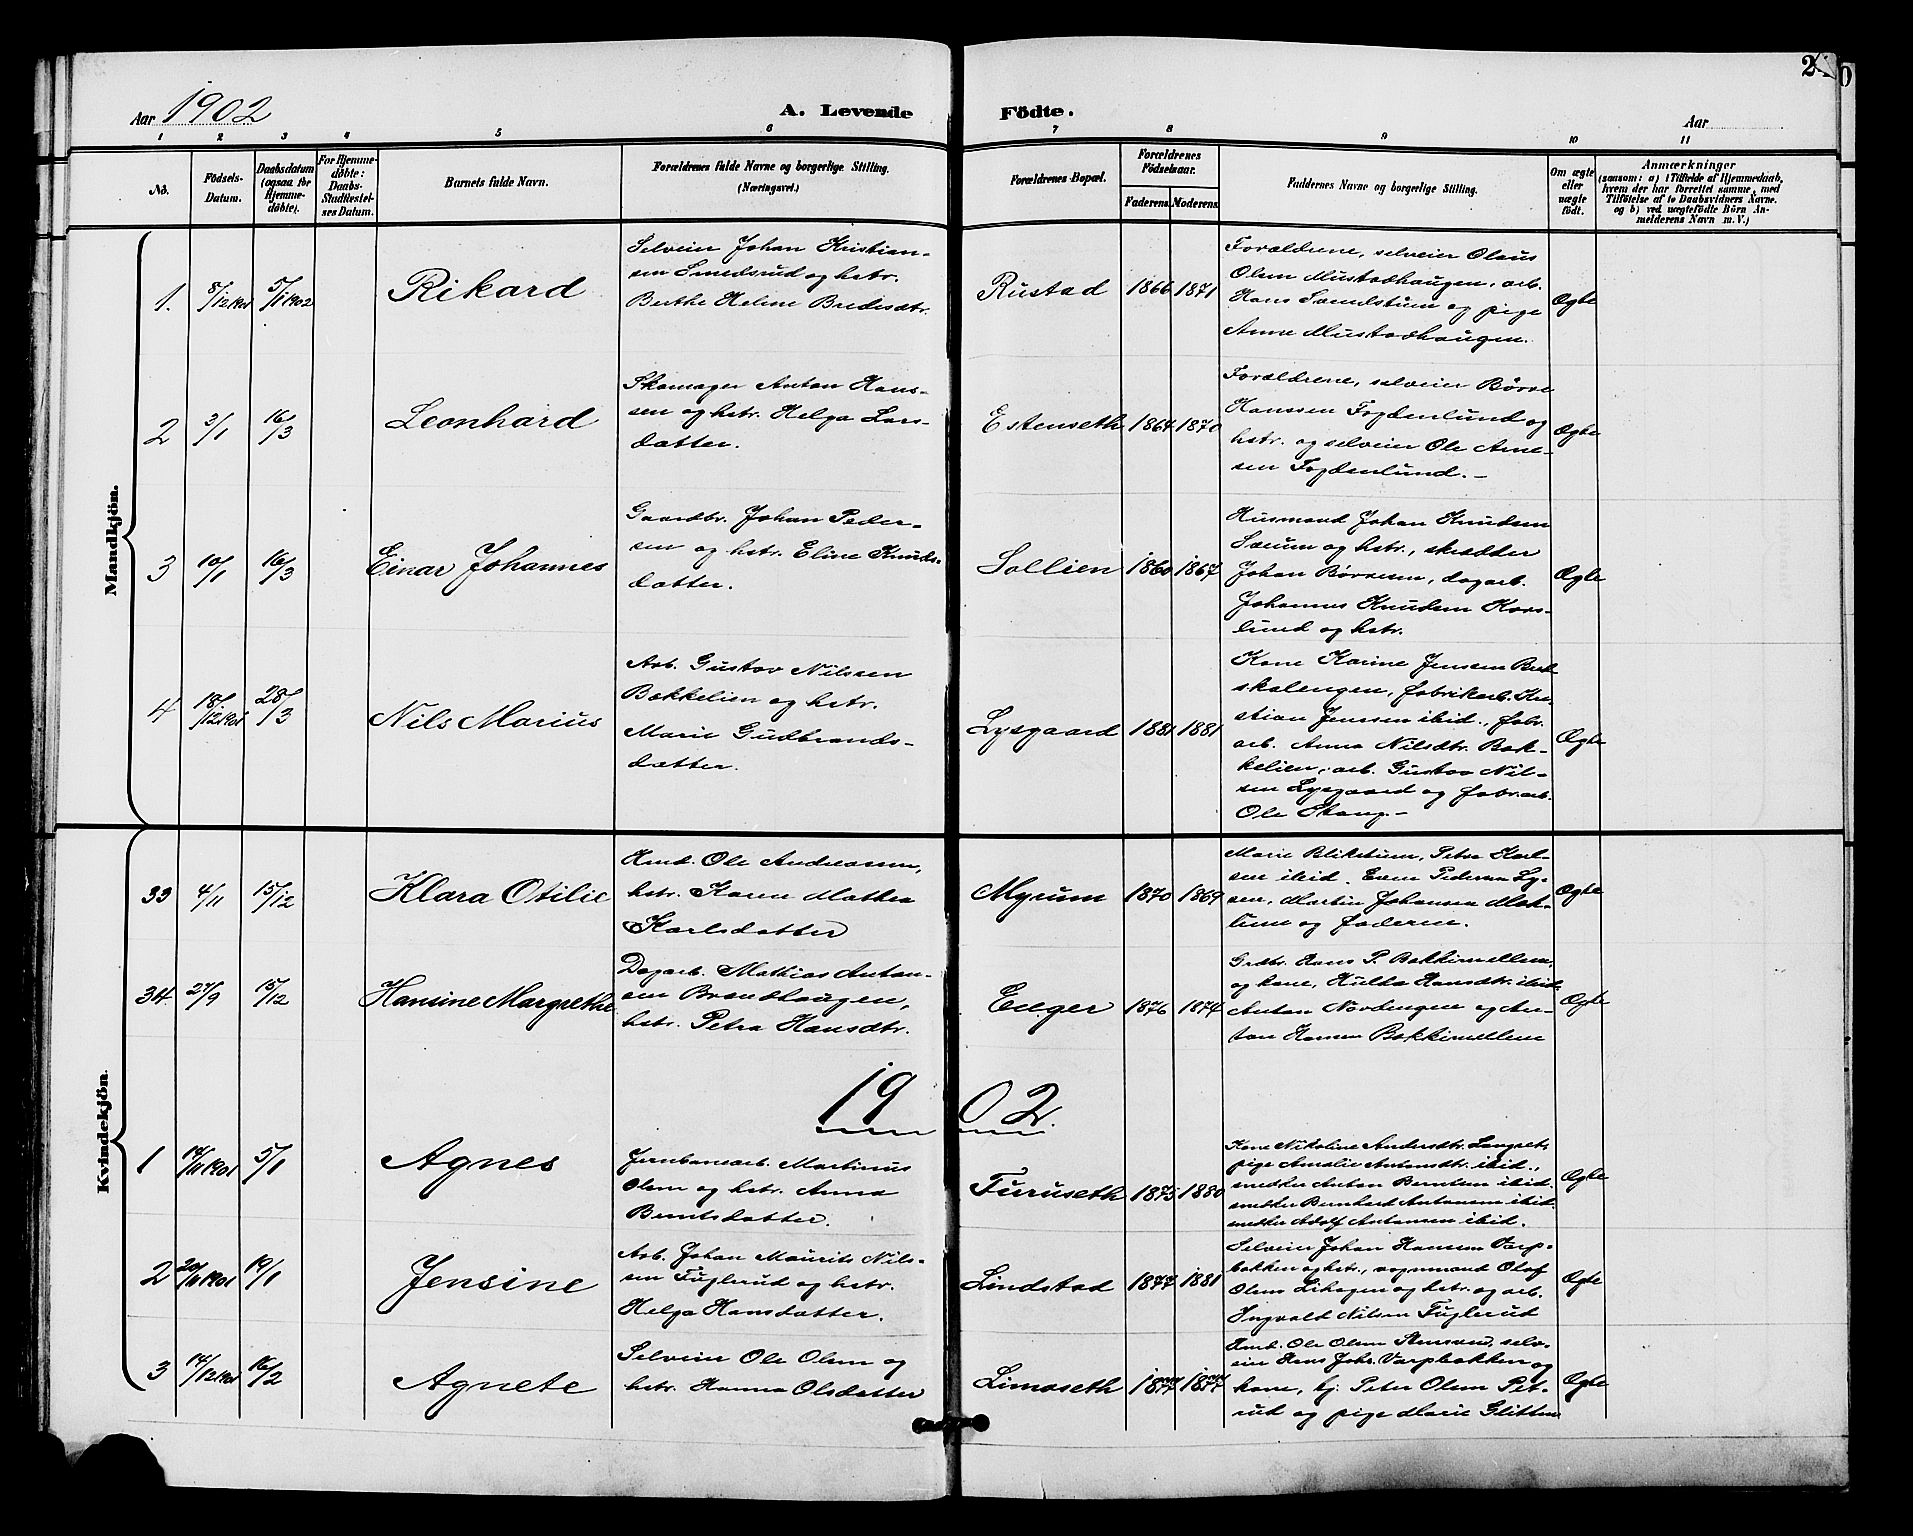 SAH, Vardal prestekontor, H/Ha/Hab/L0011: Klokkerbok nr. 11, 1899-1913, s. 24